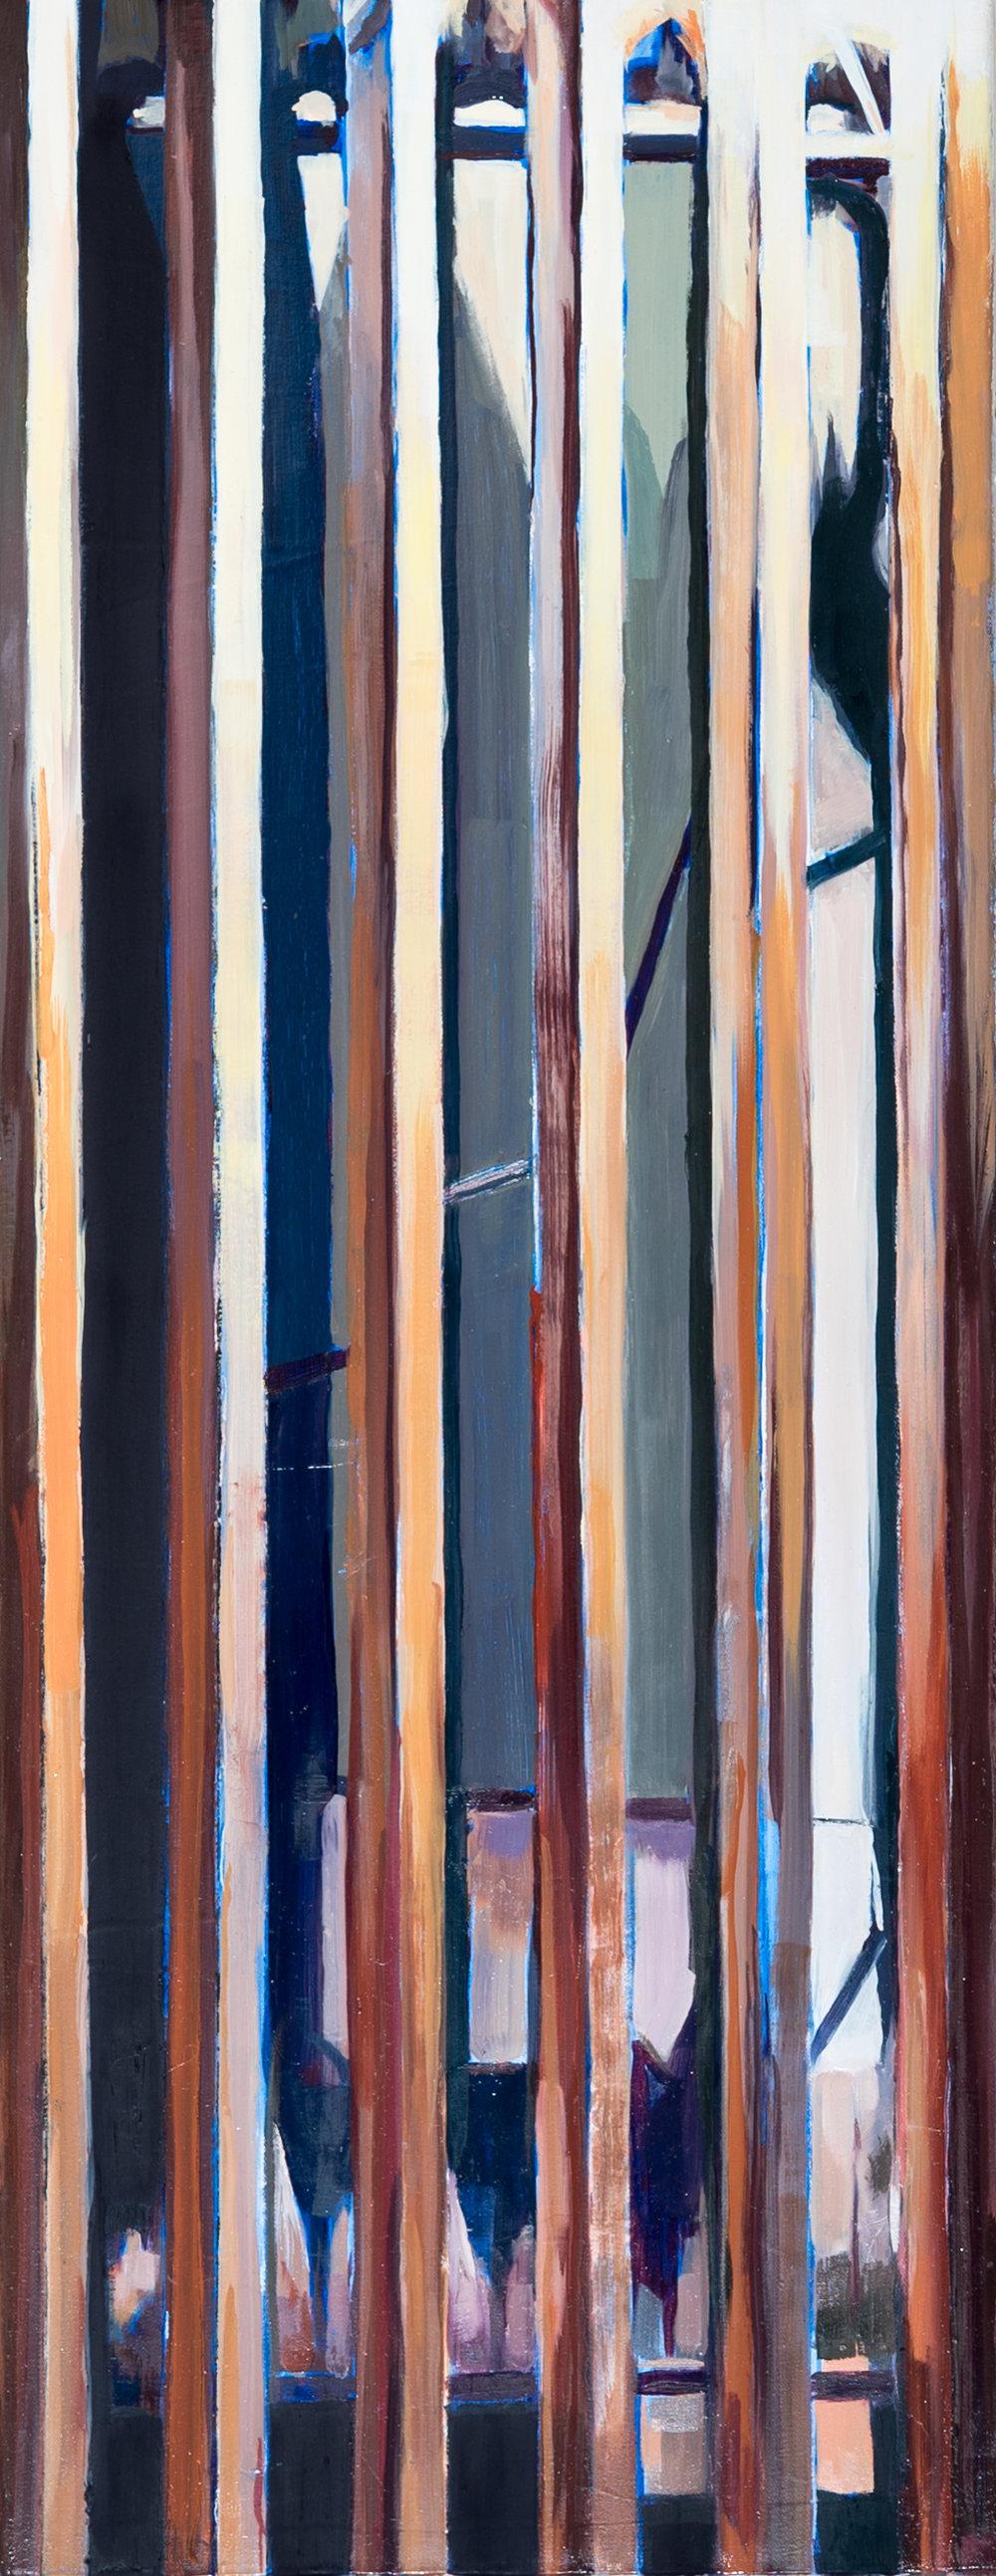 "14x36""  Oil on canvas"